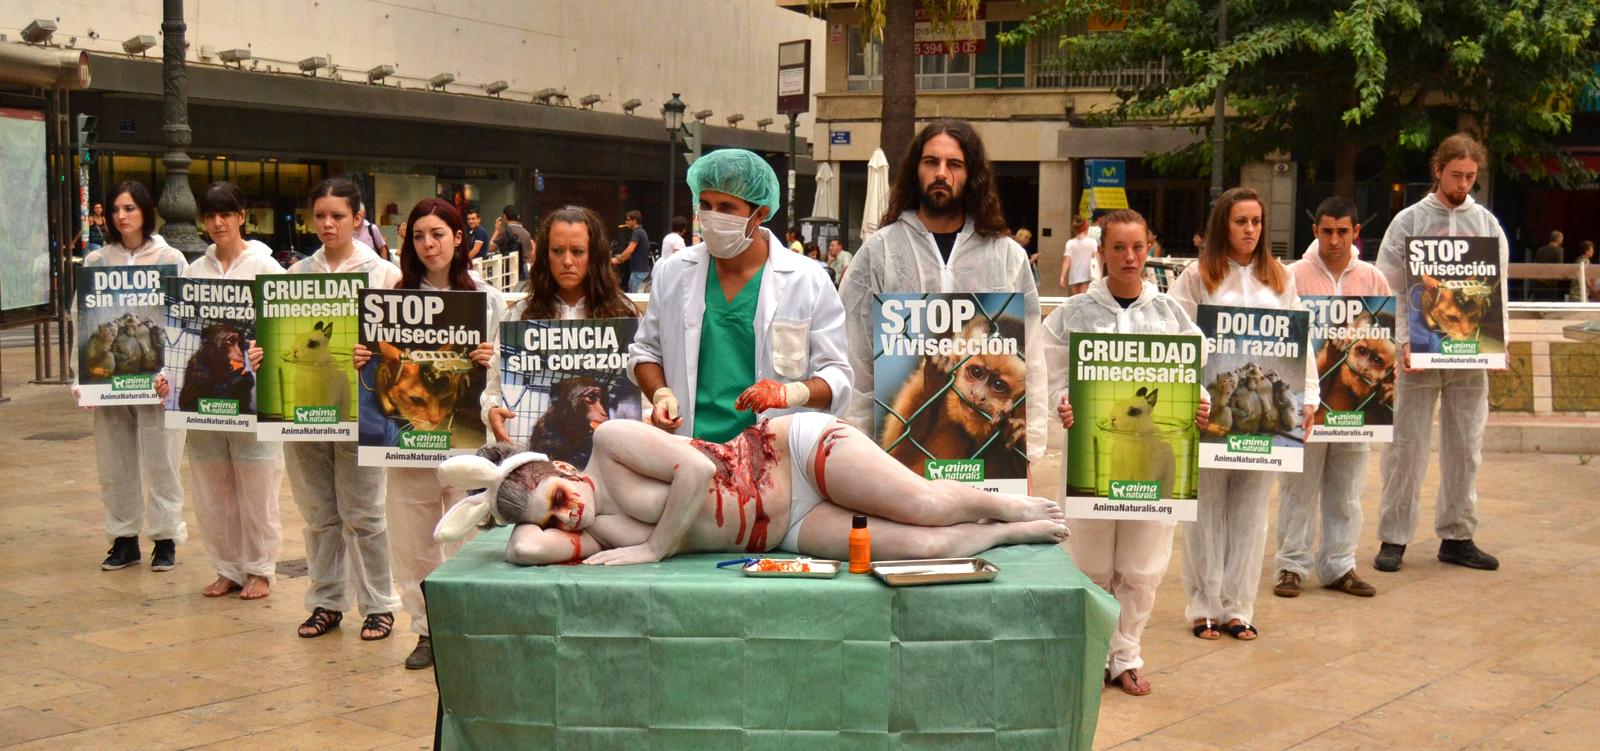 ¡Maratón de recogida de firmas de AnimaNaturalis contra vivisección!